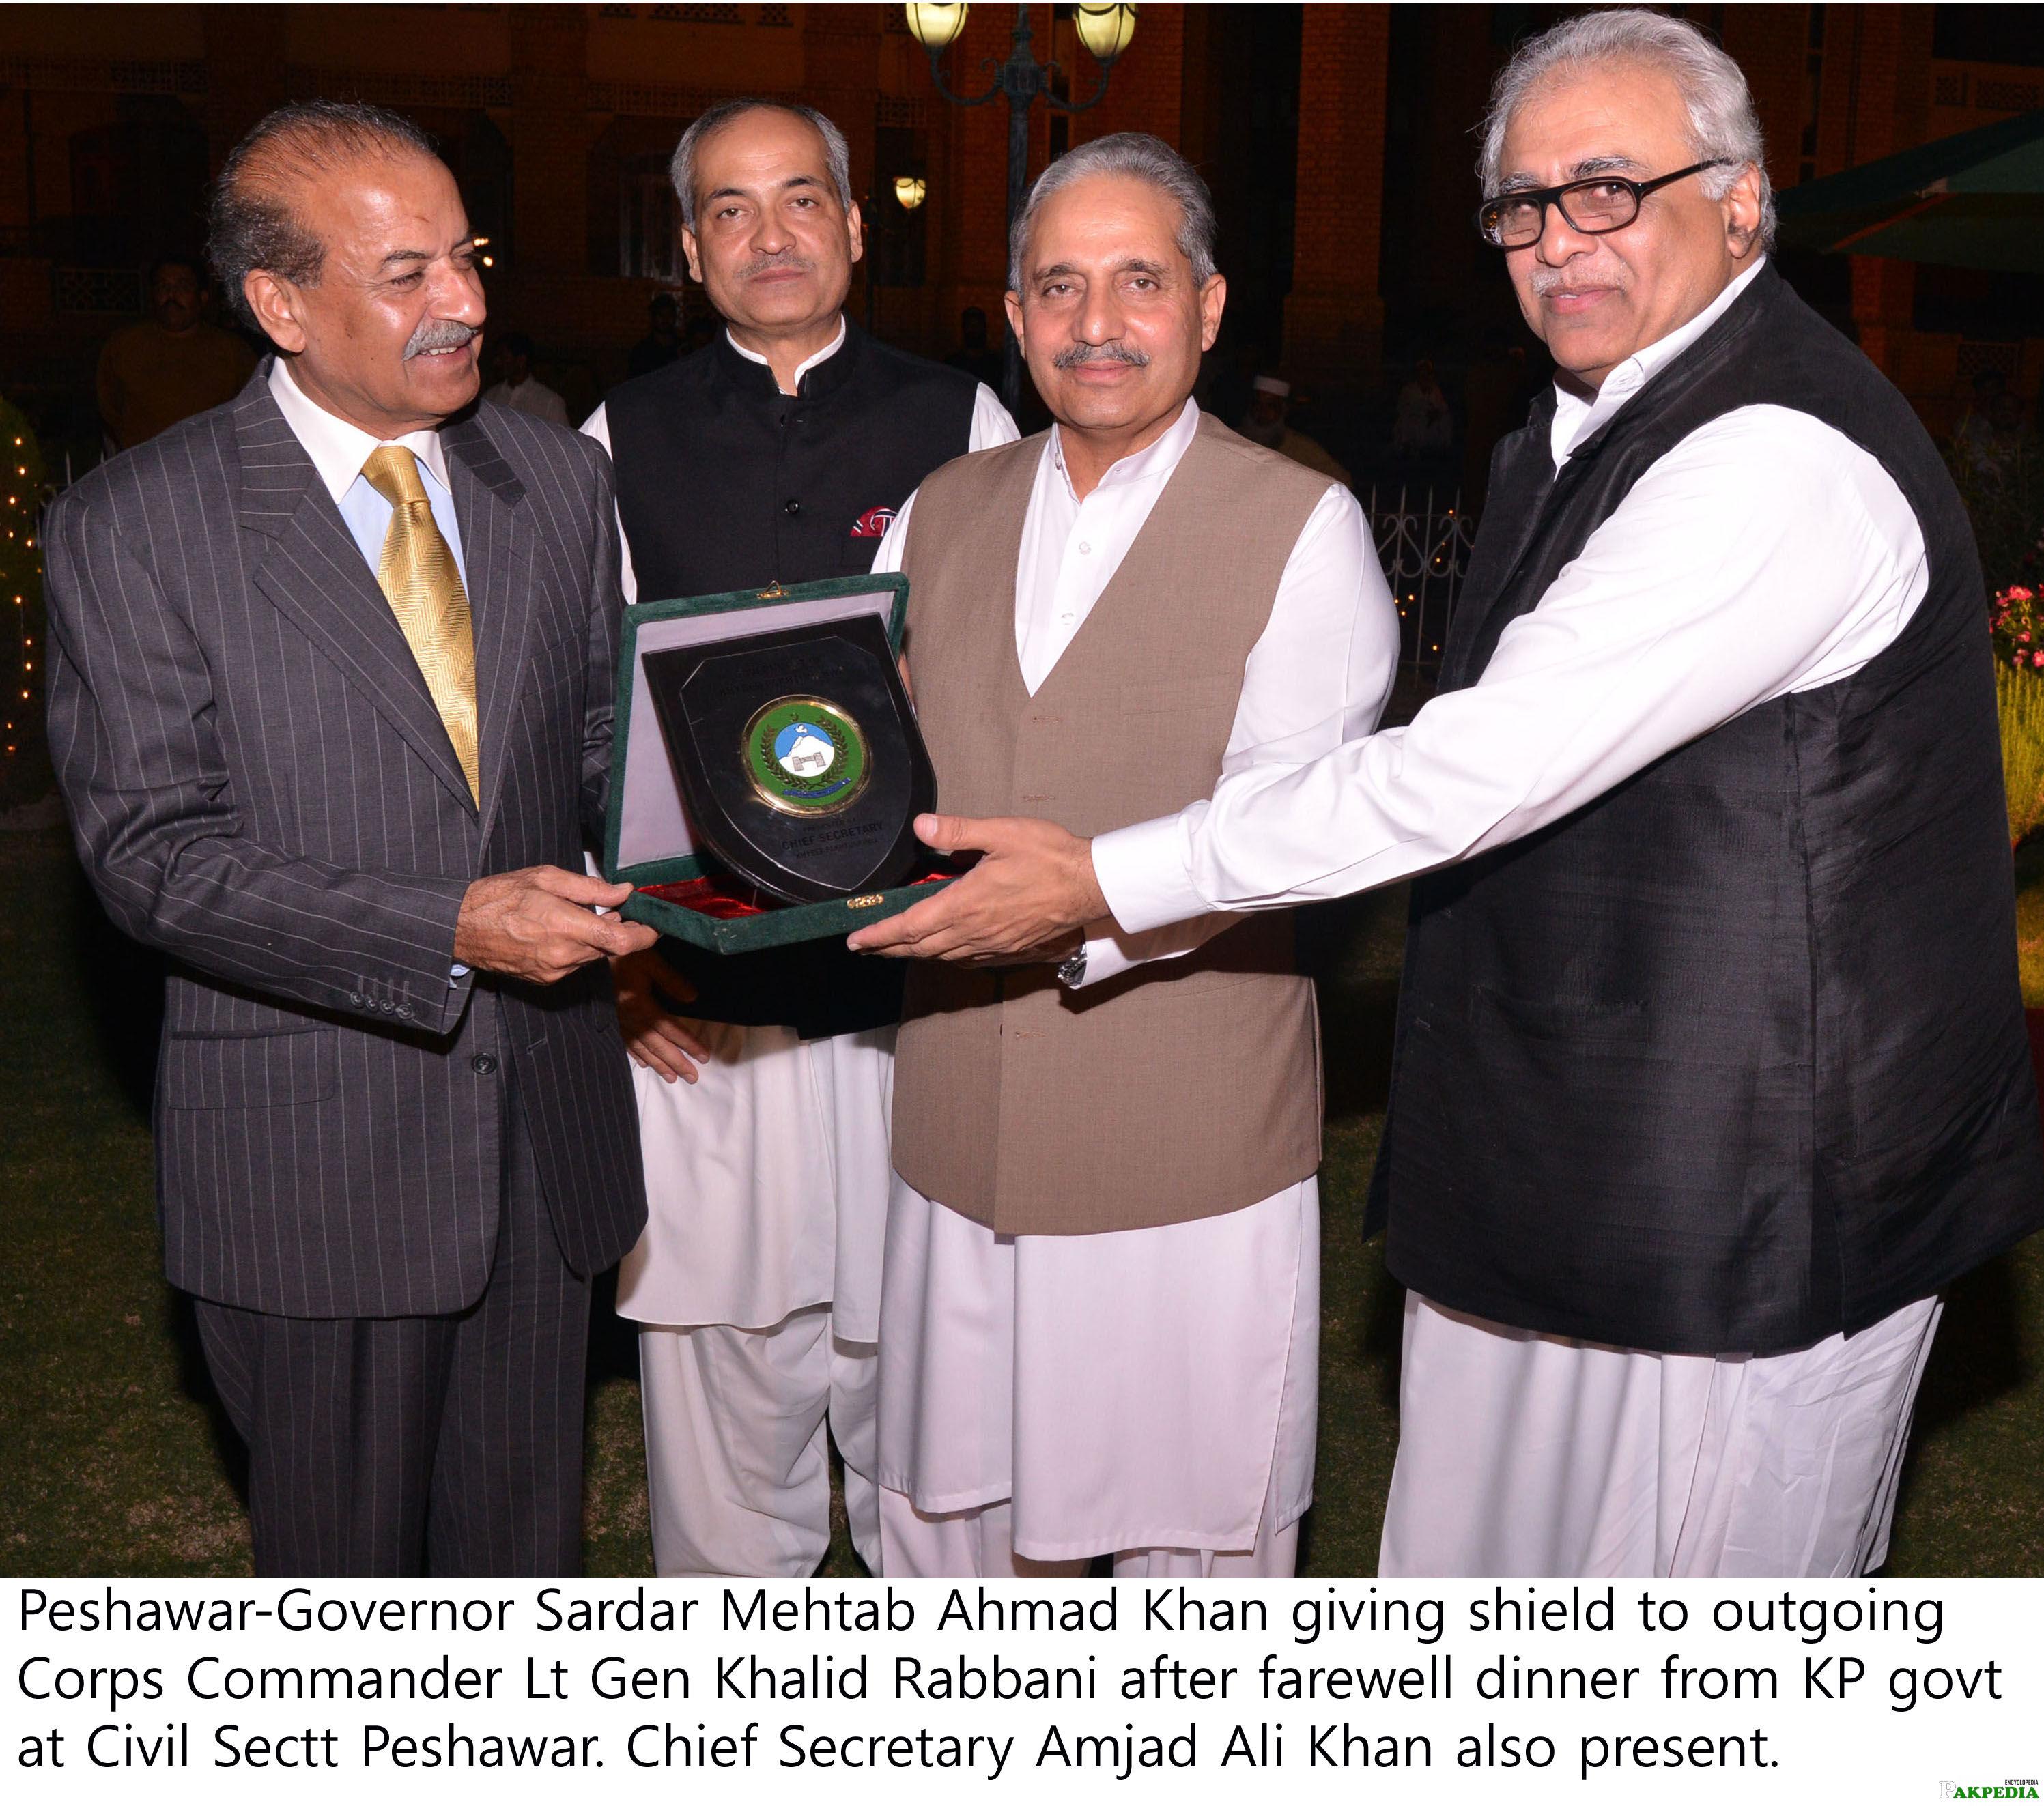 Peshawar Governor Sardar Mehtab Ahmad Khan giving shield to outgoing Commander